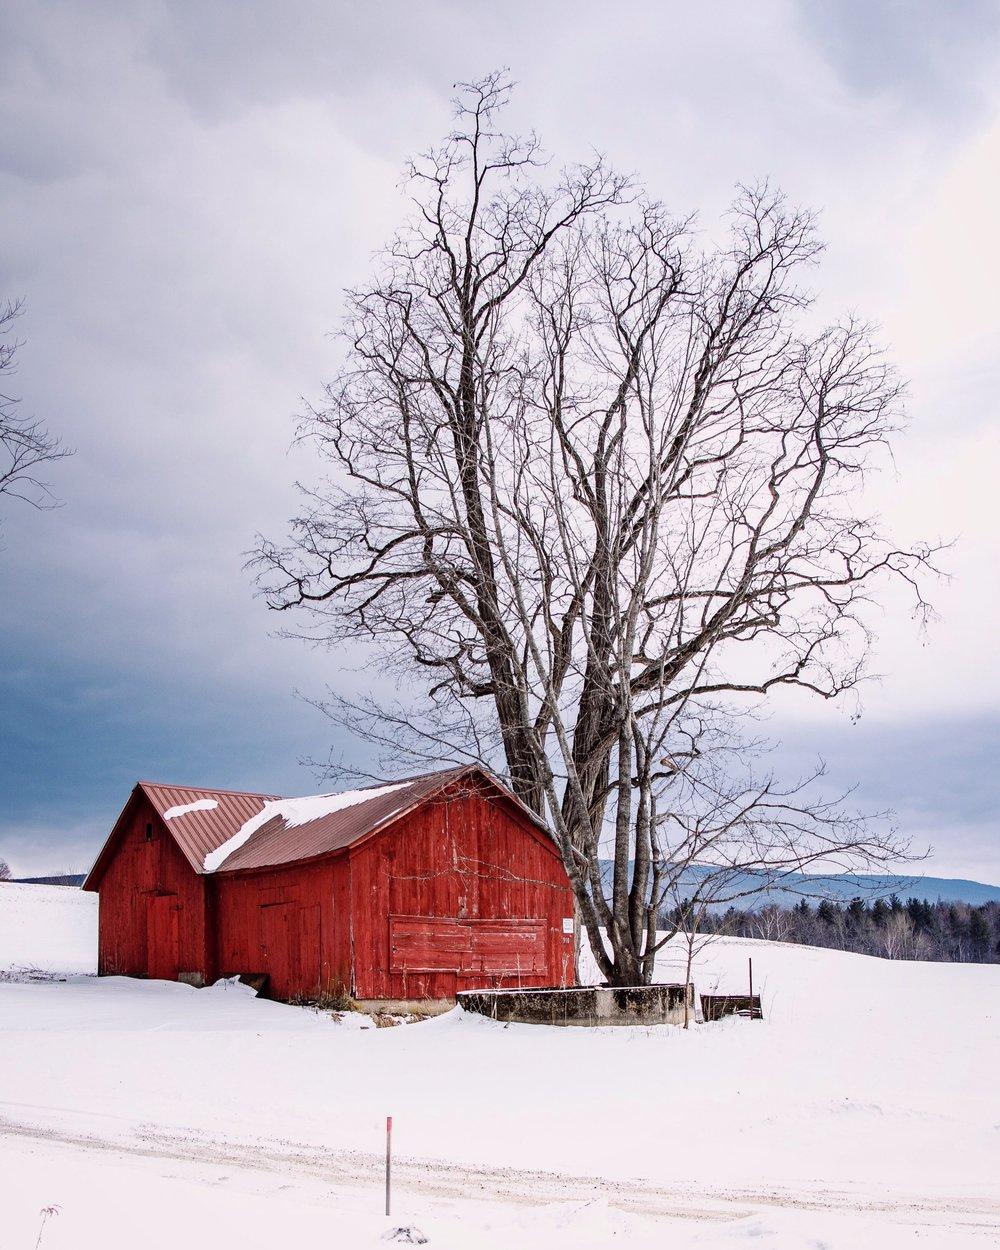 Overlook Red Barn_Manchester Vermont_Winter_February 2019.JPG